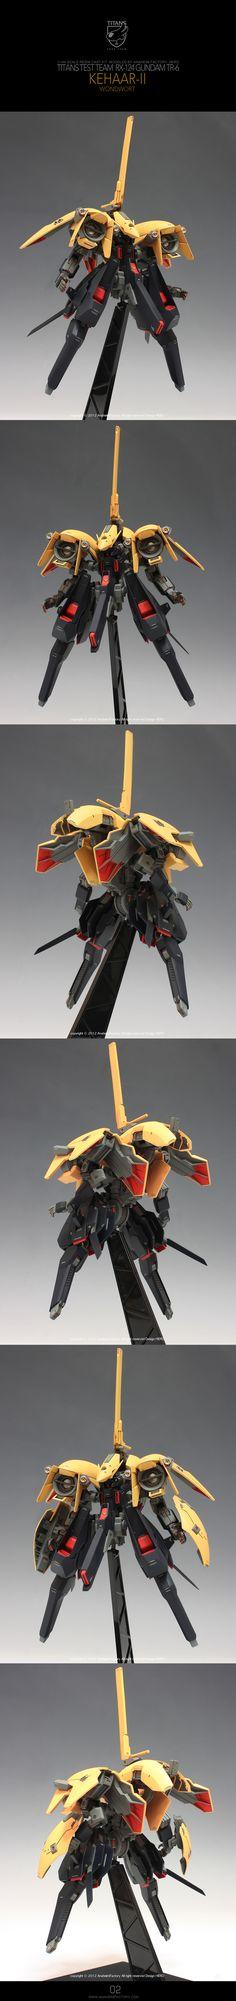 1/144 [C3xHobby] Resin Kit Remodeling by HERO: RX-124 Gundam TR-6 Kehaar-II CORPUSCULUM – WONDWORT – EWAC TYPE Mega-Full